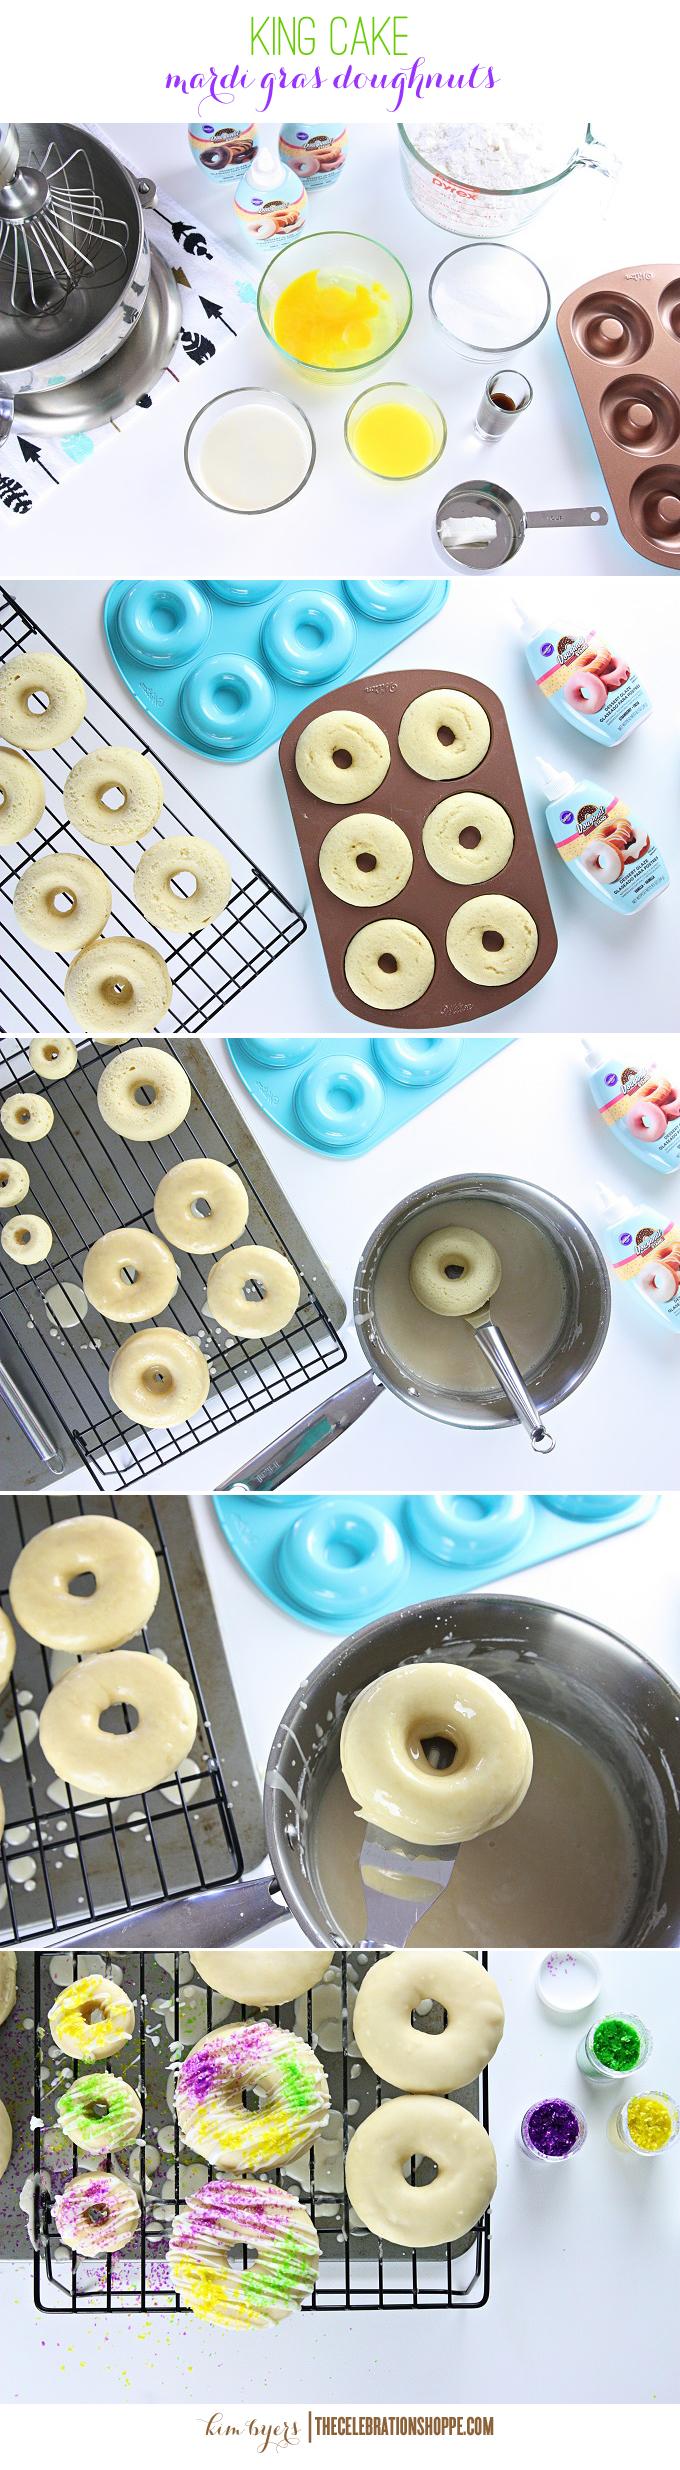 Mardi Gras Doughnuts | Kim Byers